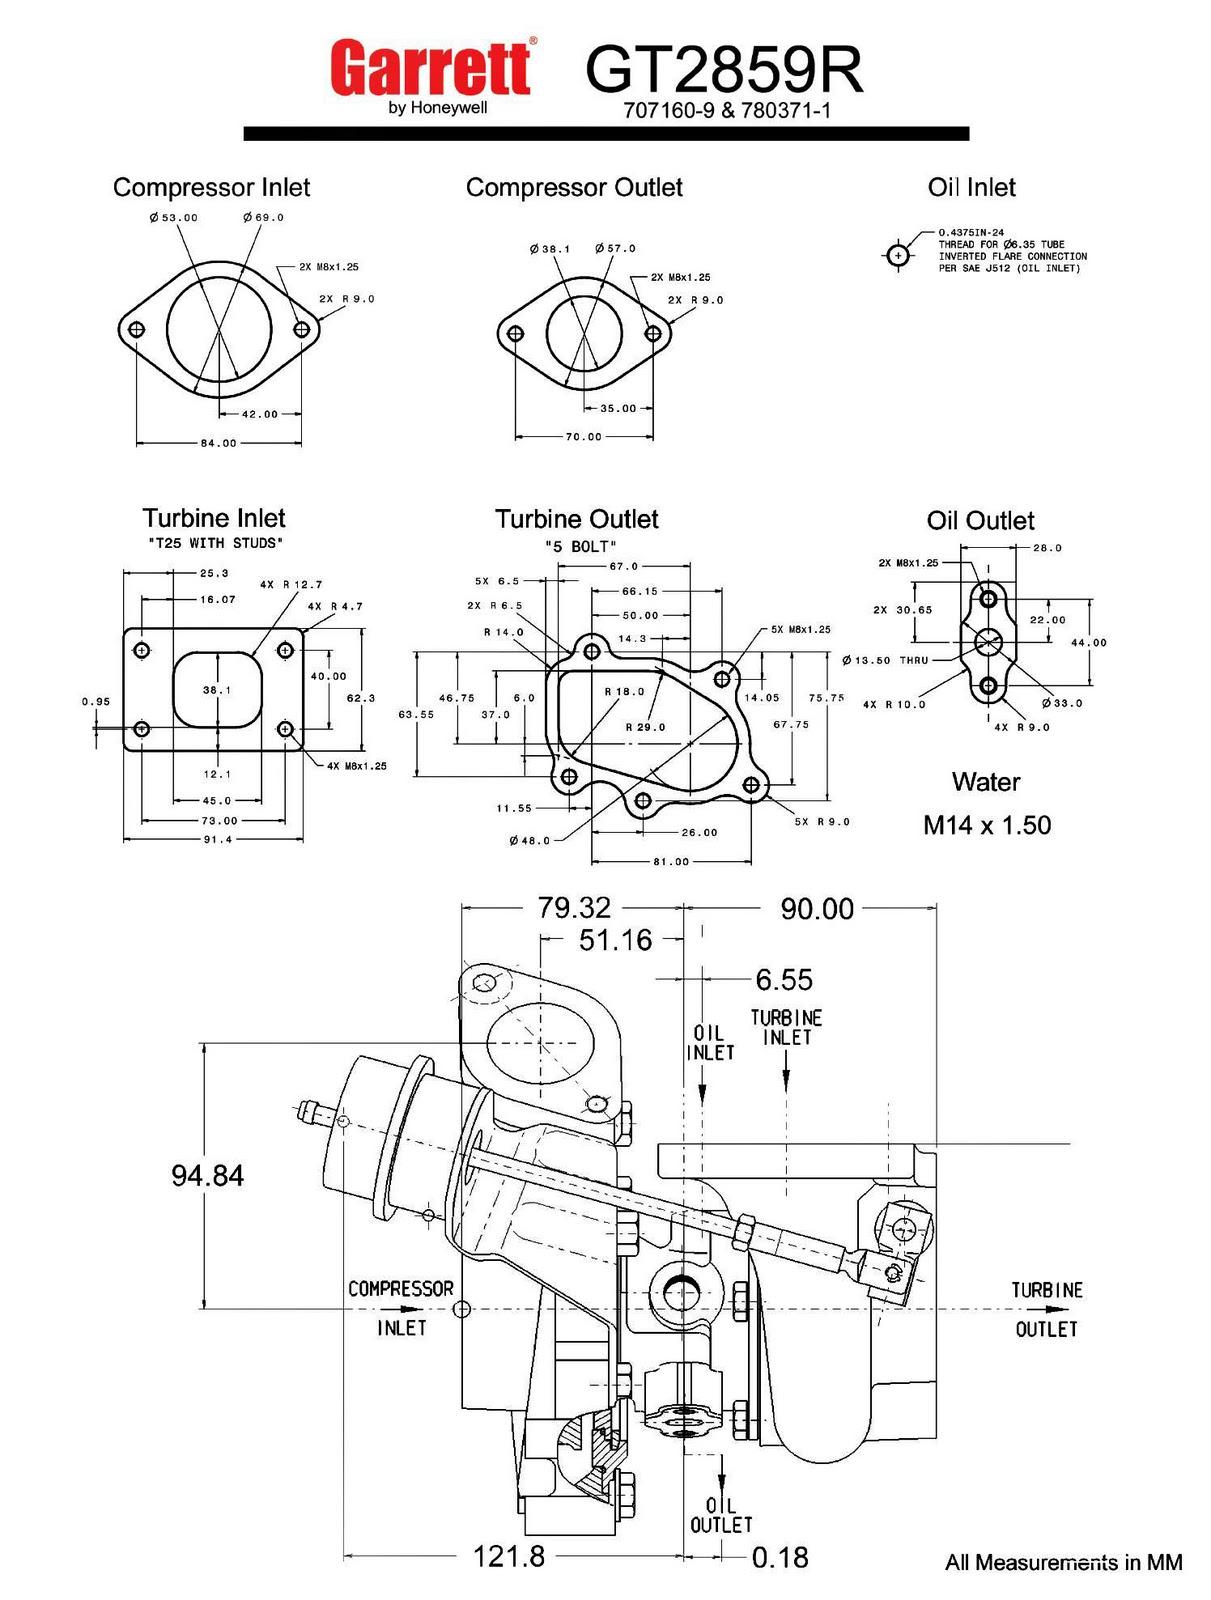 small resolution of garrett gt28r turbo gt2859r dual ball bearing measurements in mm turbocharger flanges diameter turbo flange honeywell 1496x1977